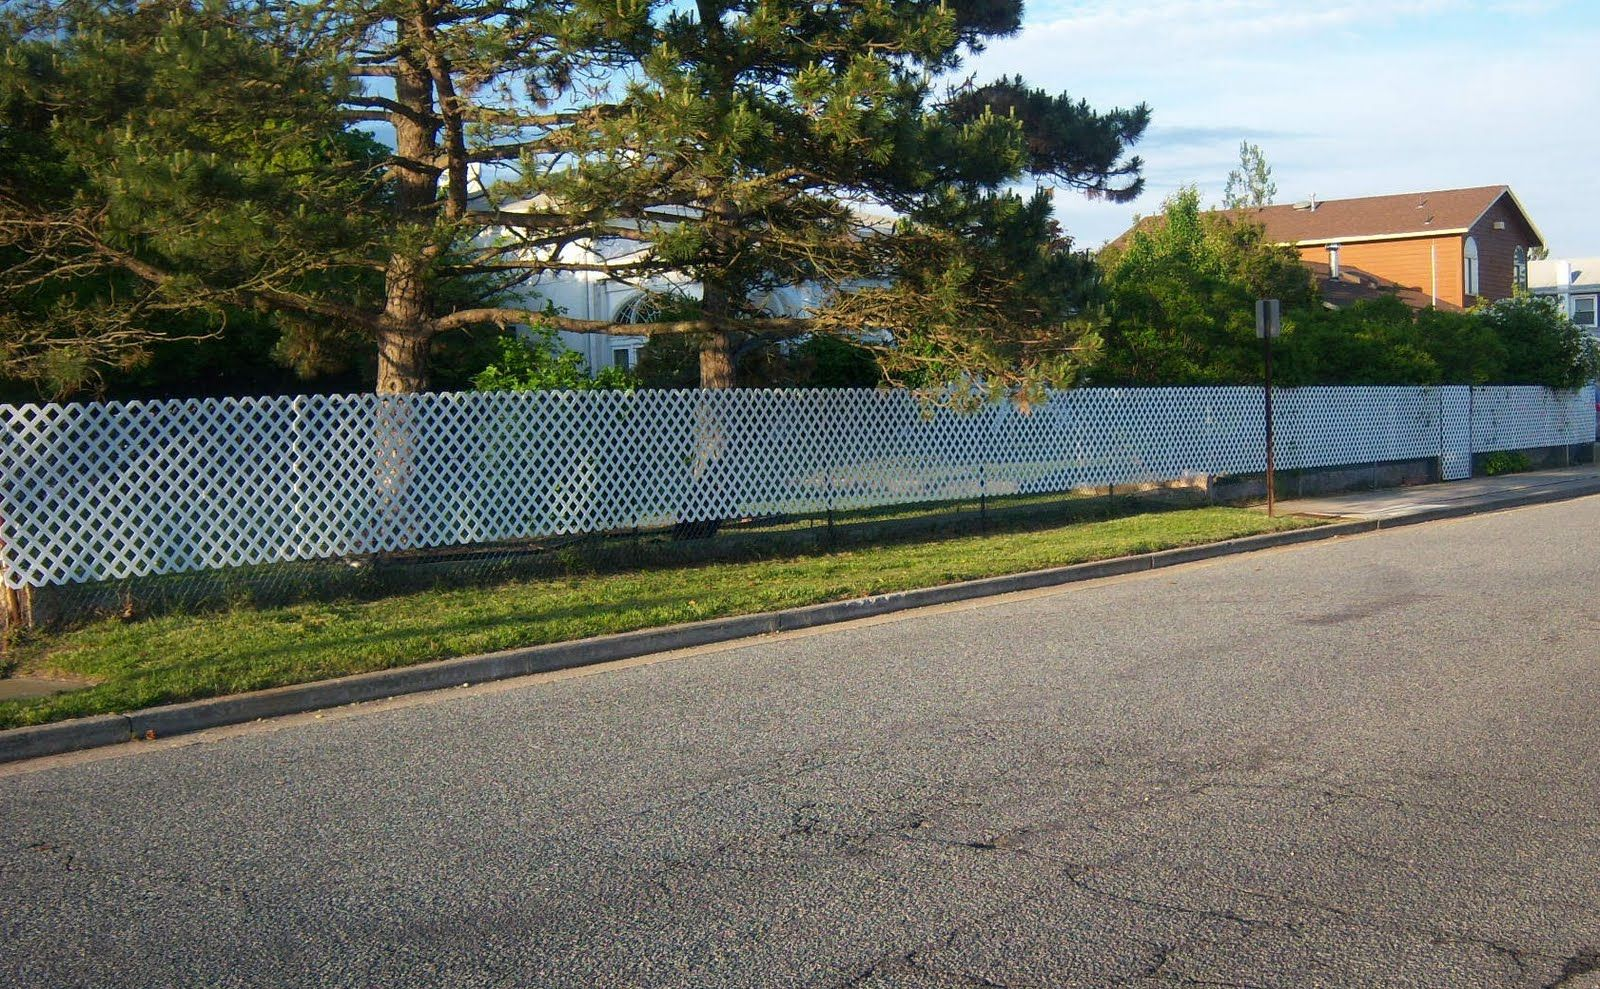 Install Vinyl Lattice Over Chain Link Fence For Appearance And Privacy Chain Link Fence Fence Panels Lattice Fence